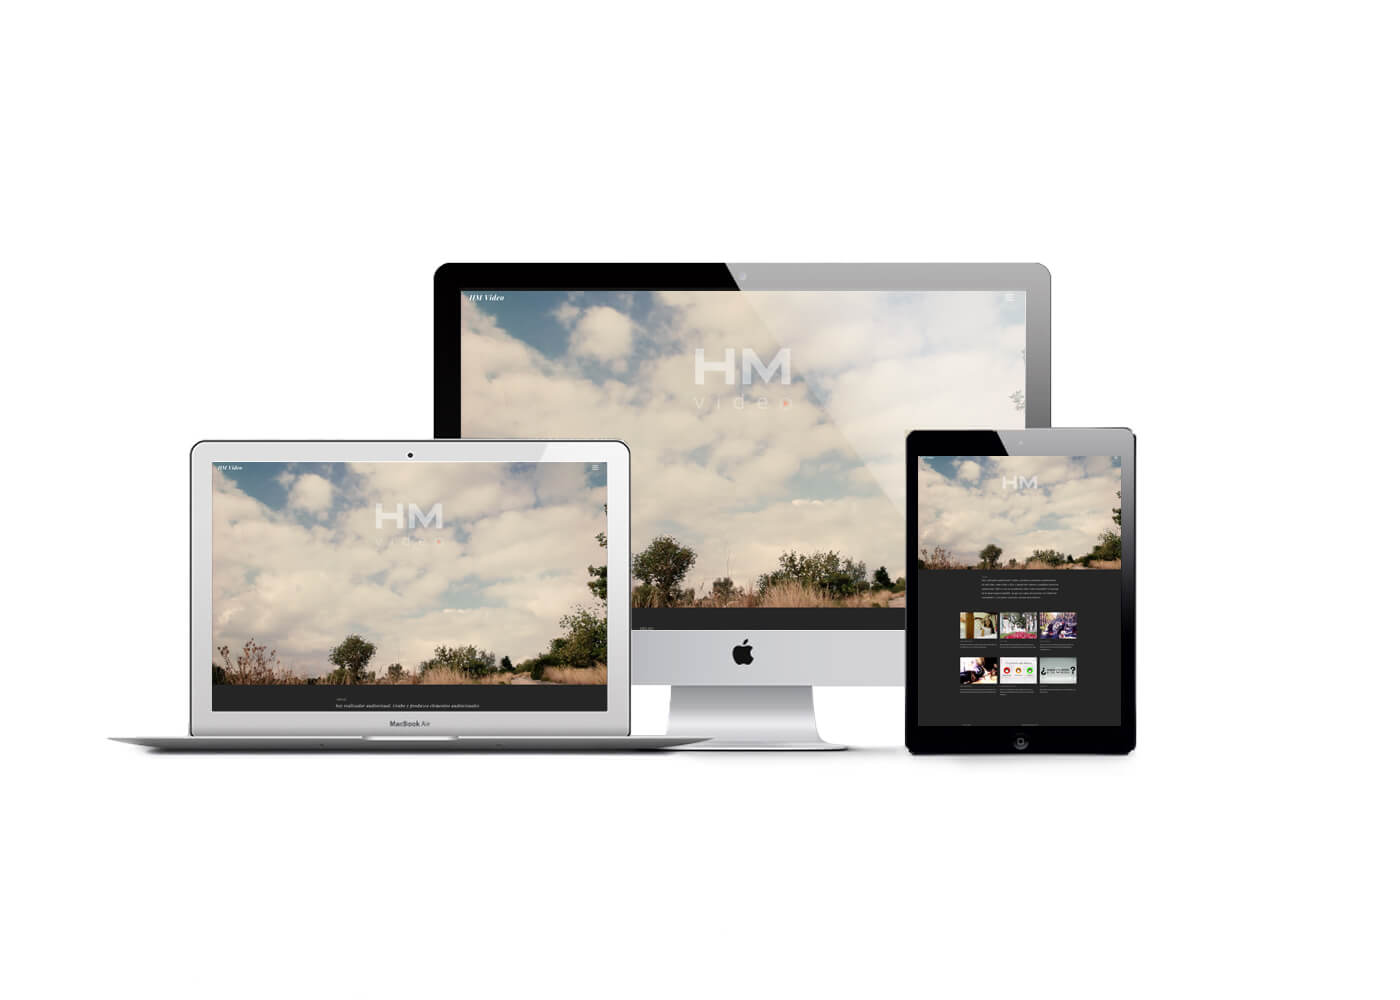 Página web HM Vídeo responsive | The Superway Webs